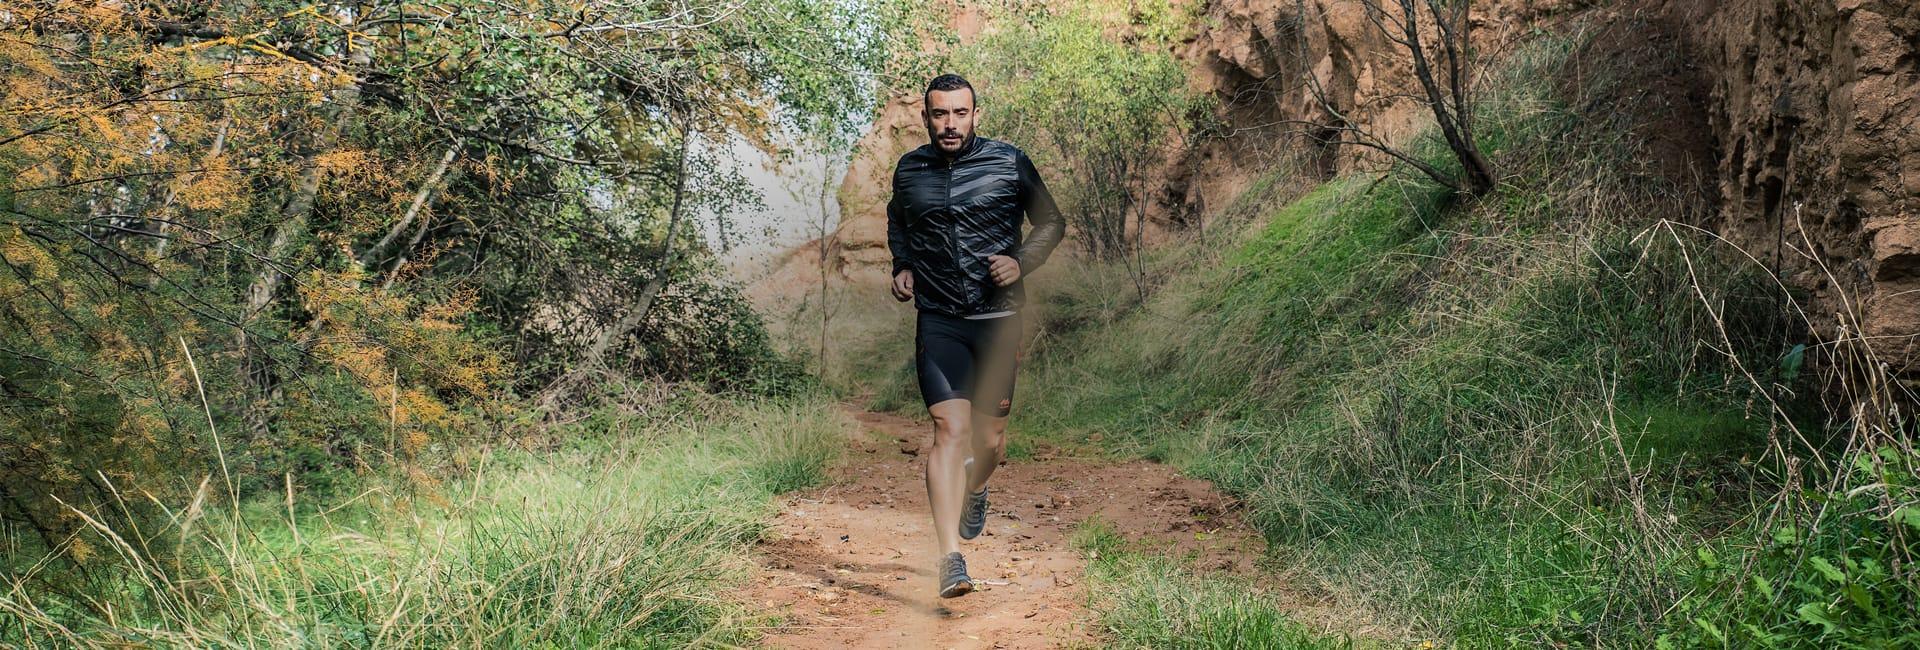 Merrell | Trail Running